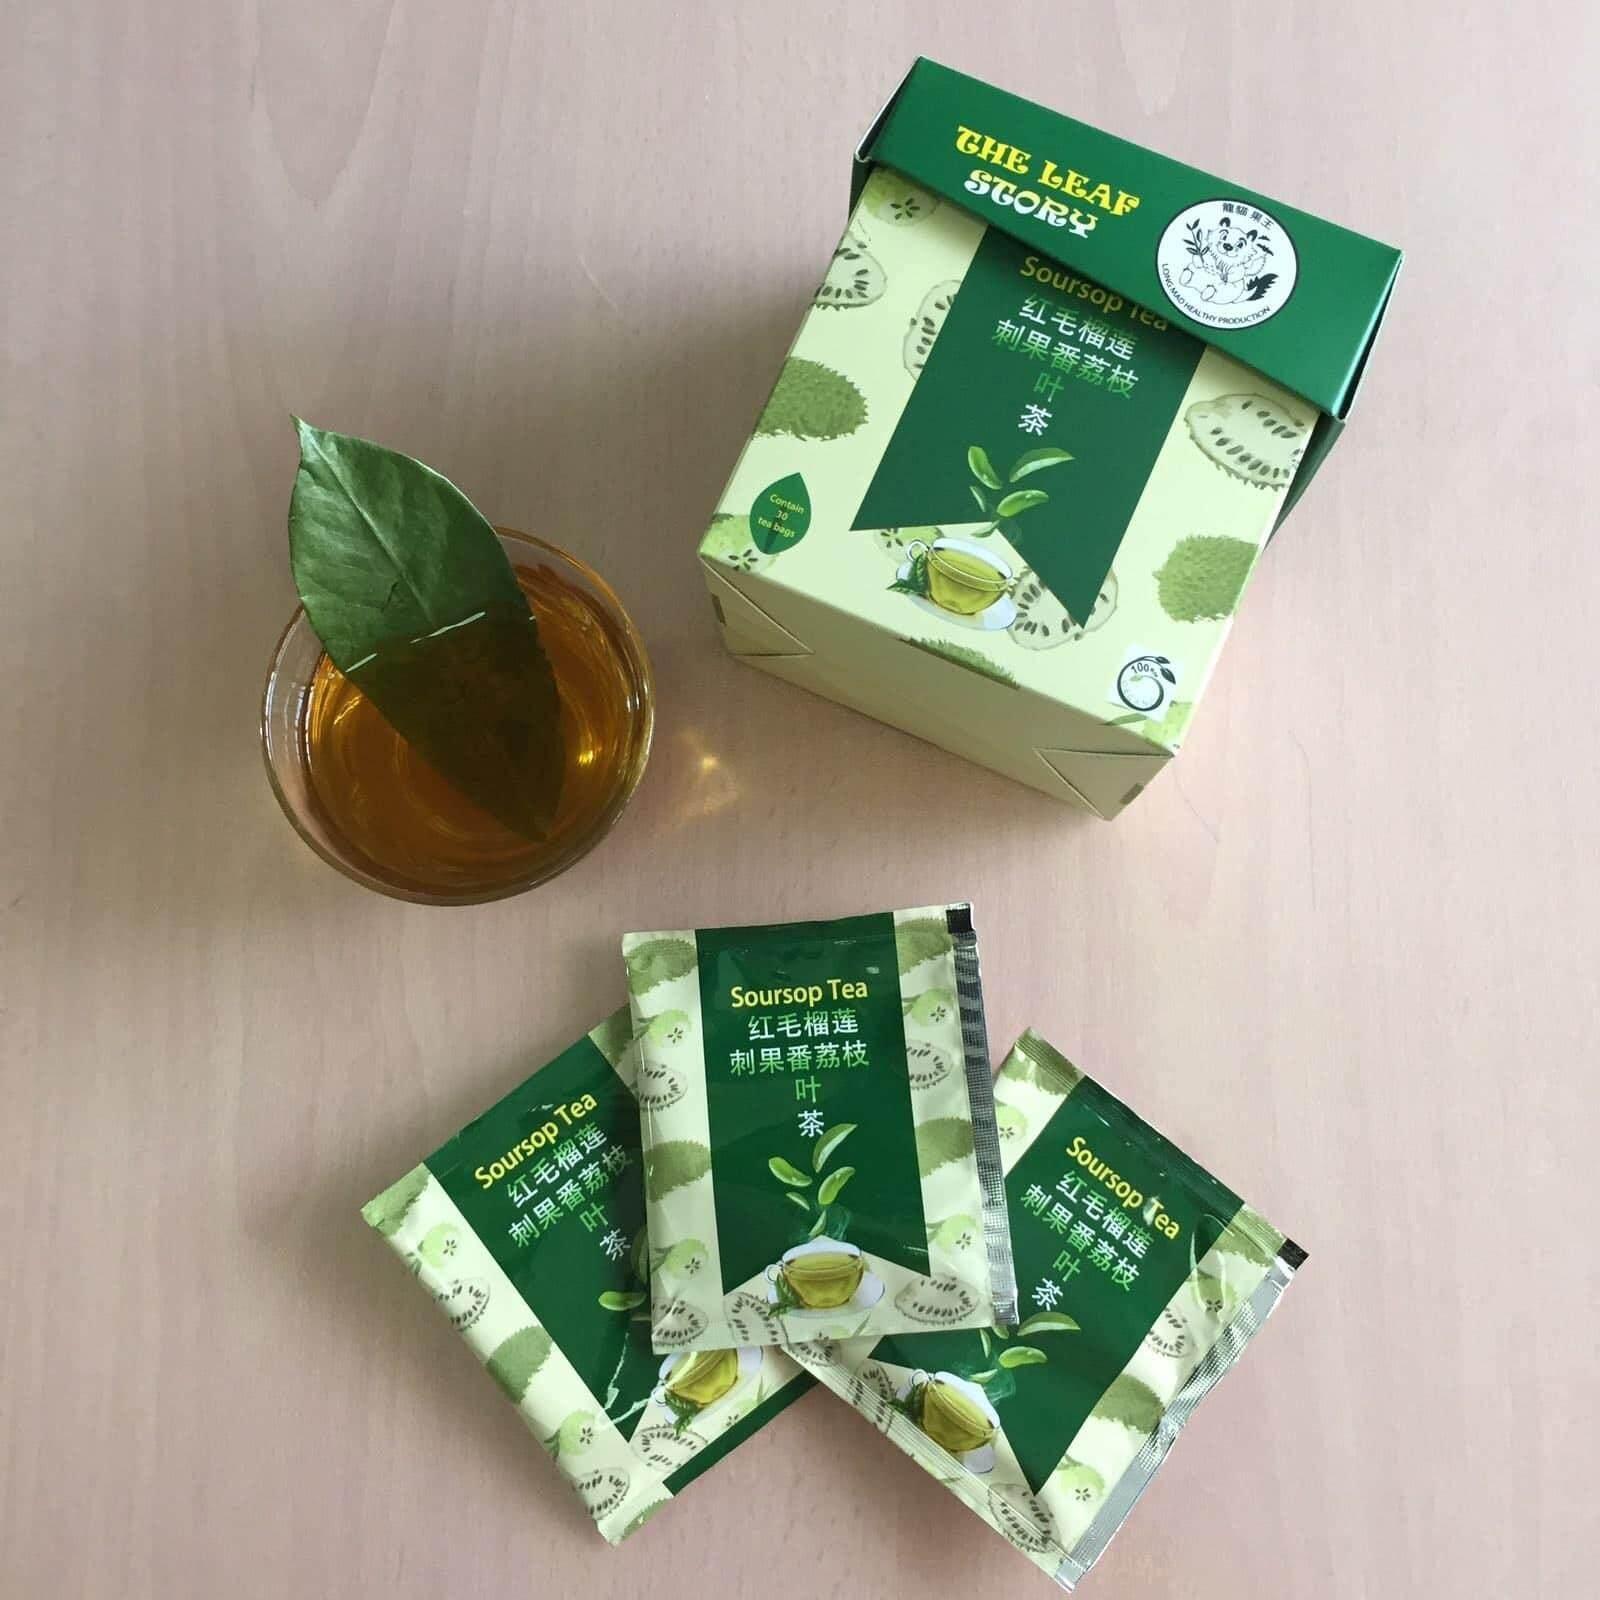 Sell Soursop Leaf Tea Cheapest Best Quality My Store Graviola 100 Concentrate Daun Sirsak Myr 60